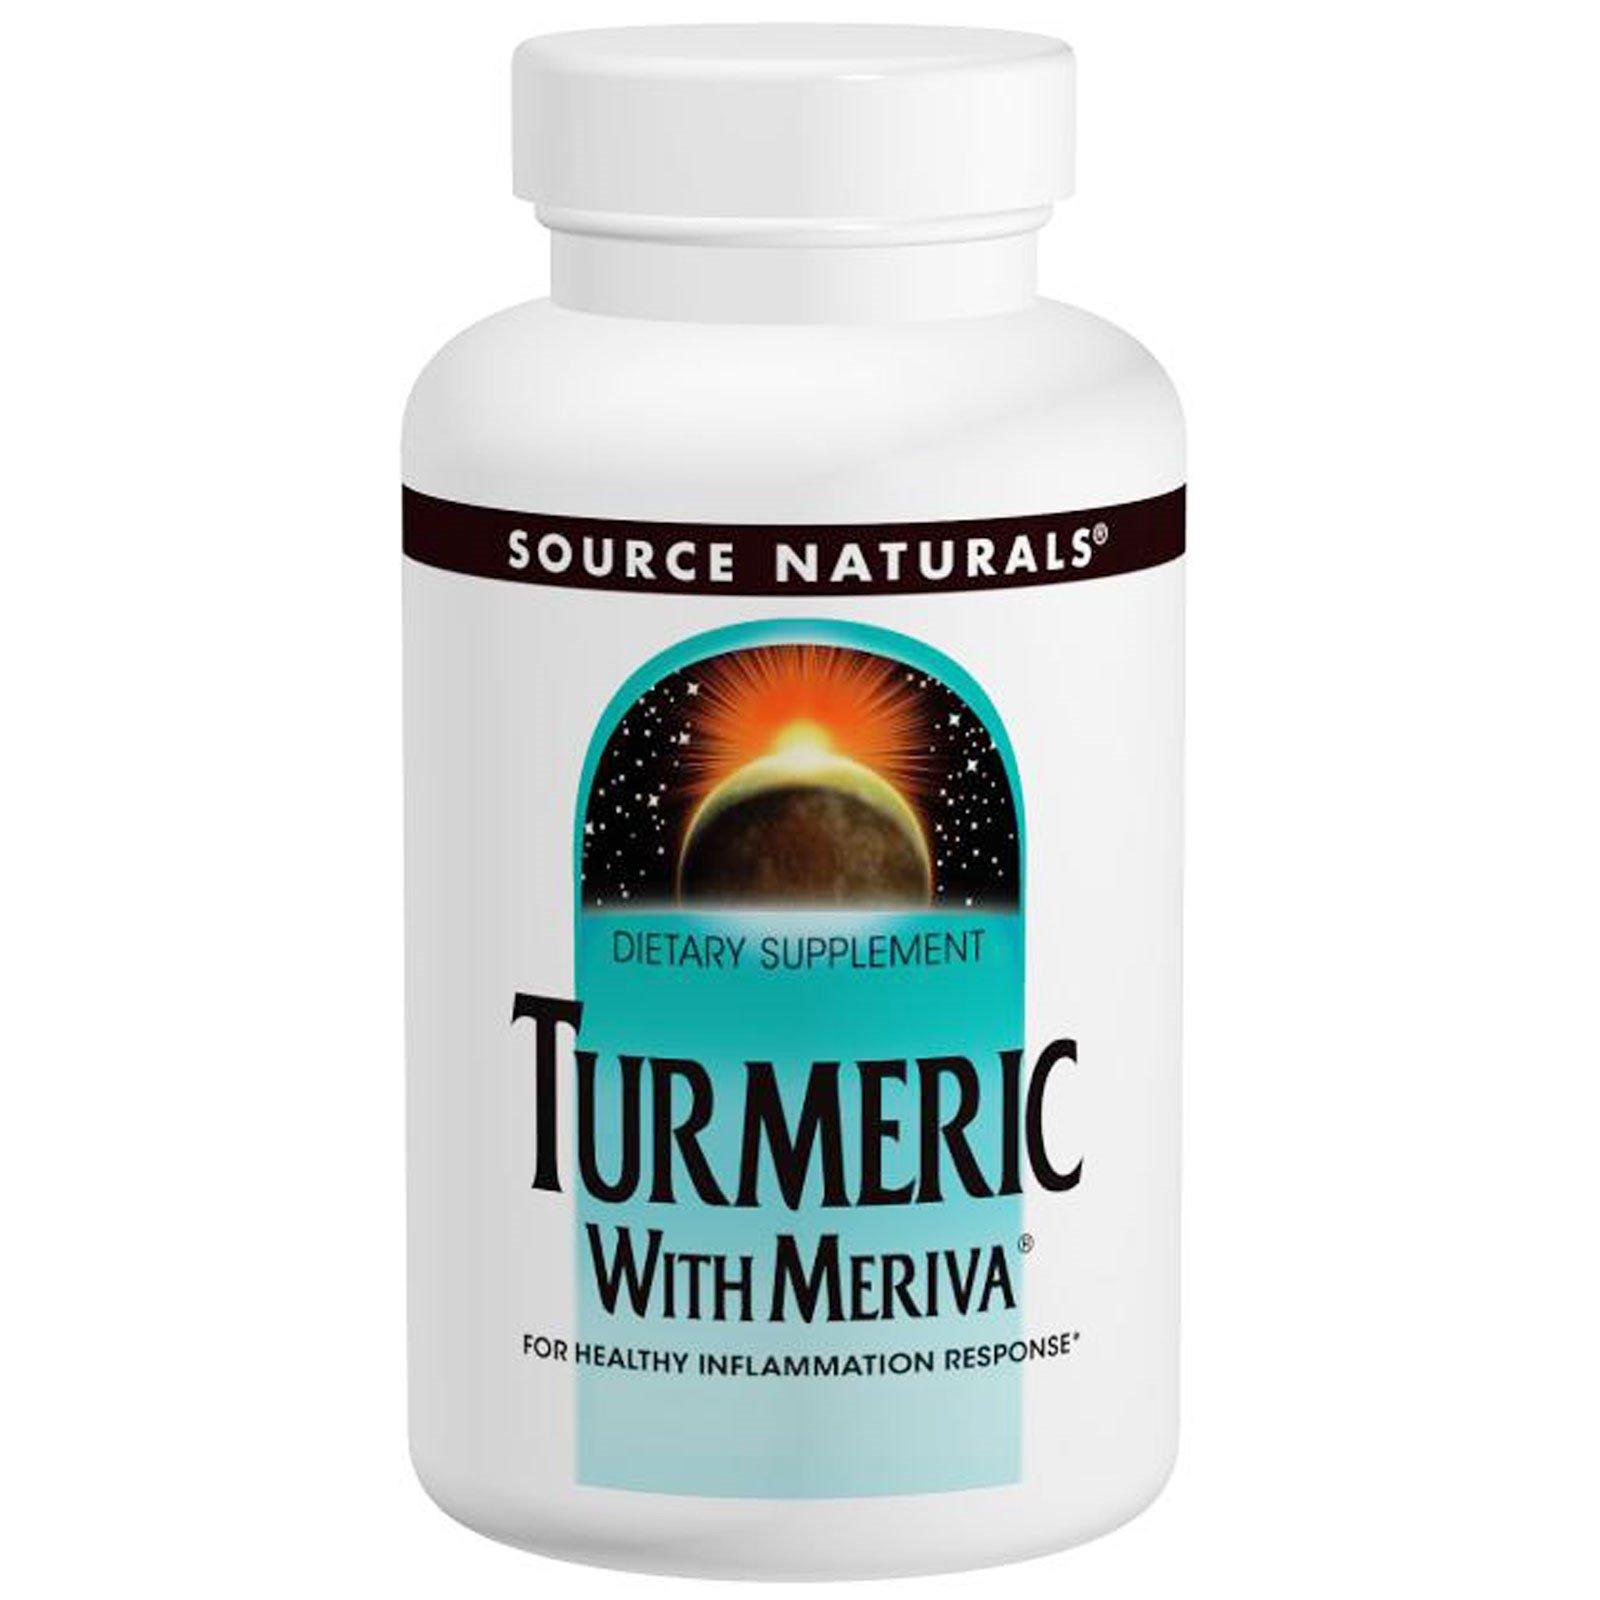 Source Naturals Turmeric with Meriva 500mg - 120 Capsules (2 Pack)